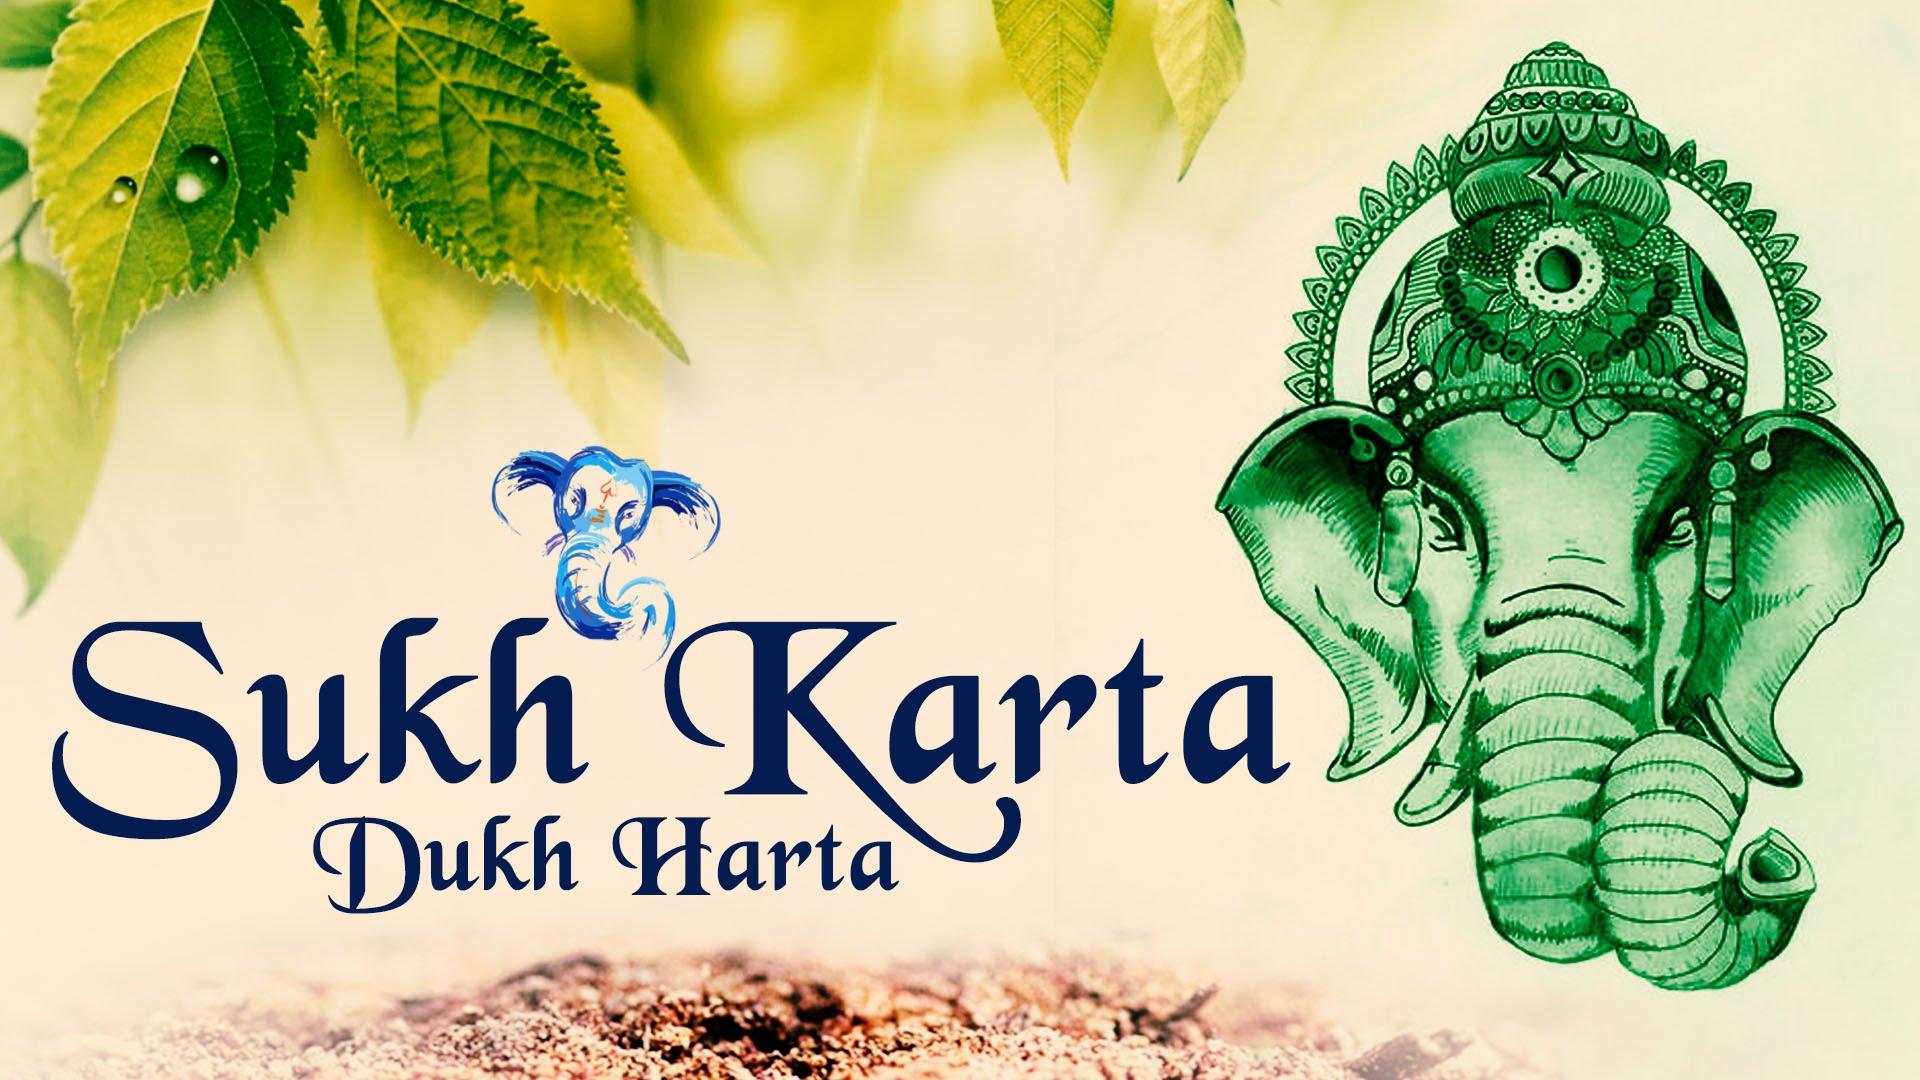 Sukh Karta Dukh Harta Mp3 Download Pagalworld